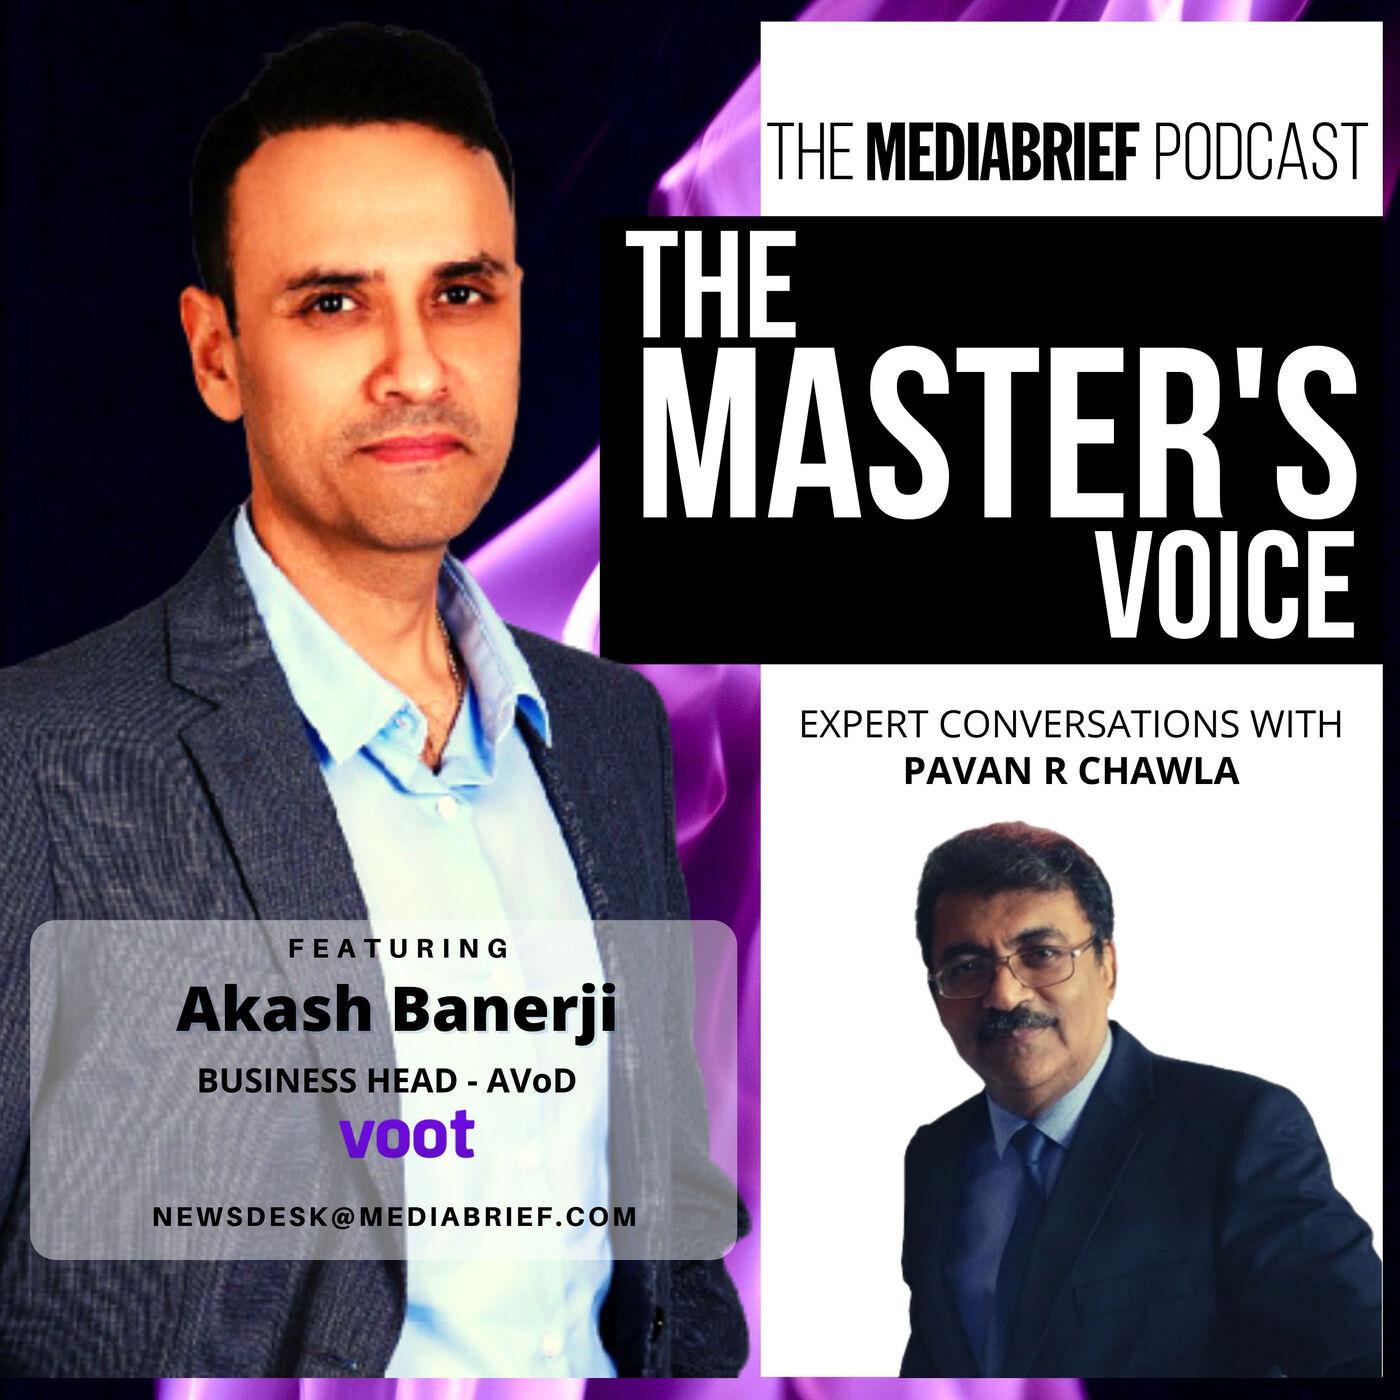 PODCAST: Akash Banerji, Business Head AVOD - VOOT on The Master's Voice